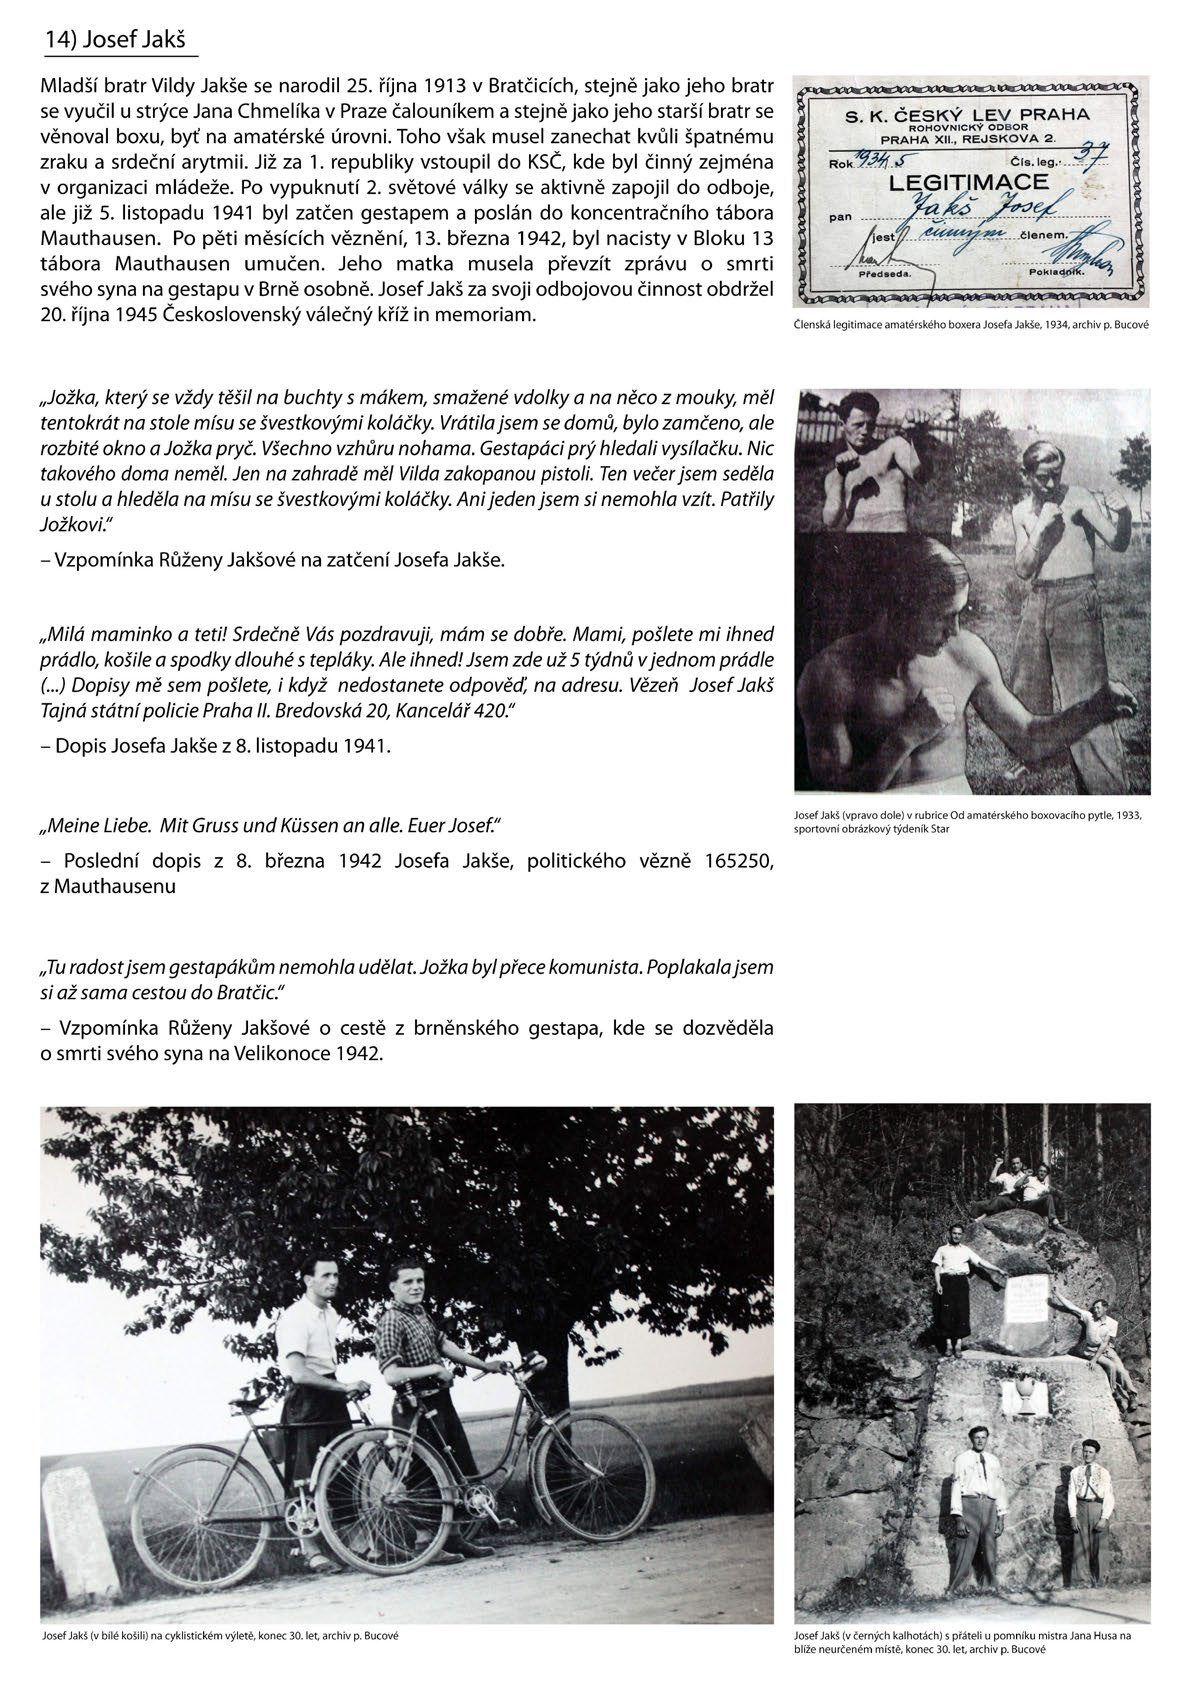 Výstava Vilda Jakš - Josef Jakš